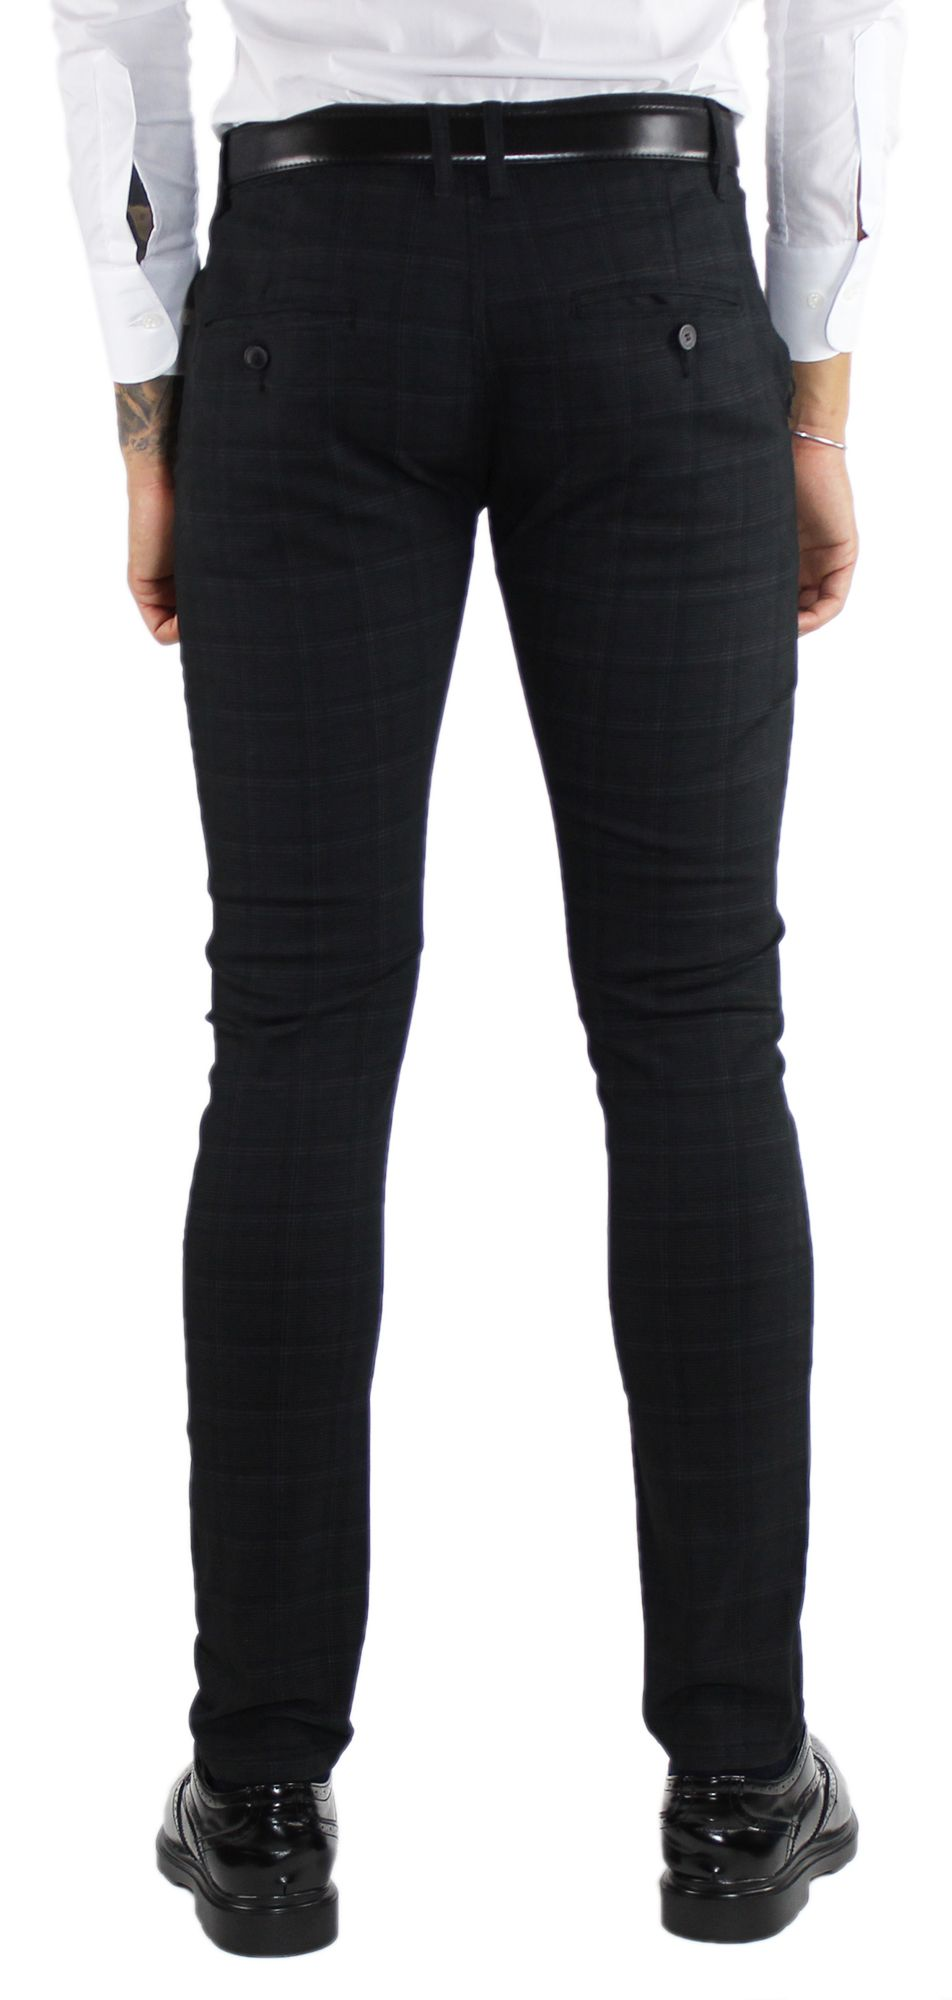 Pantaloni-Uomo-Invernali-a-Quadri-Eleganti-Pantalone-Slim-Fit-Elasticizzati-Scoz miniatura 11